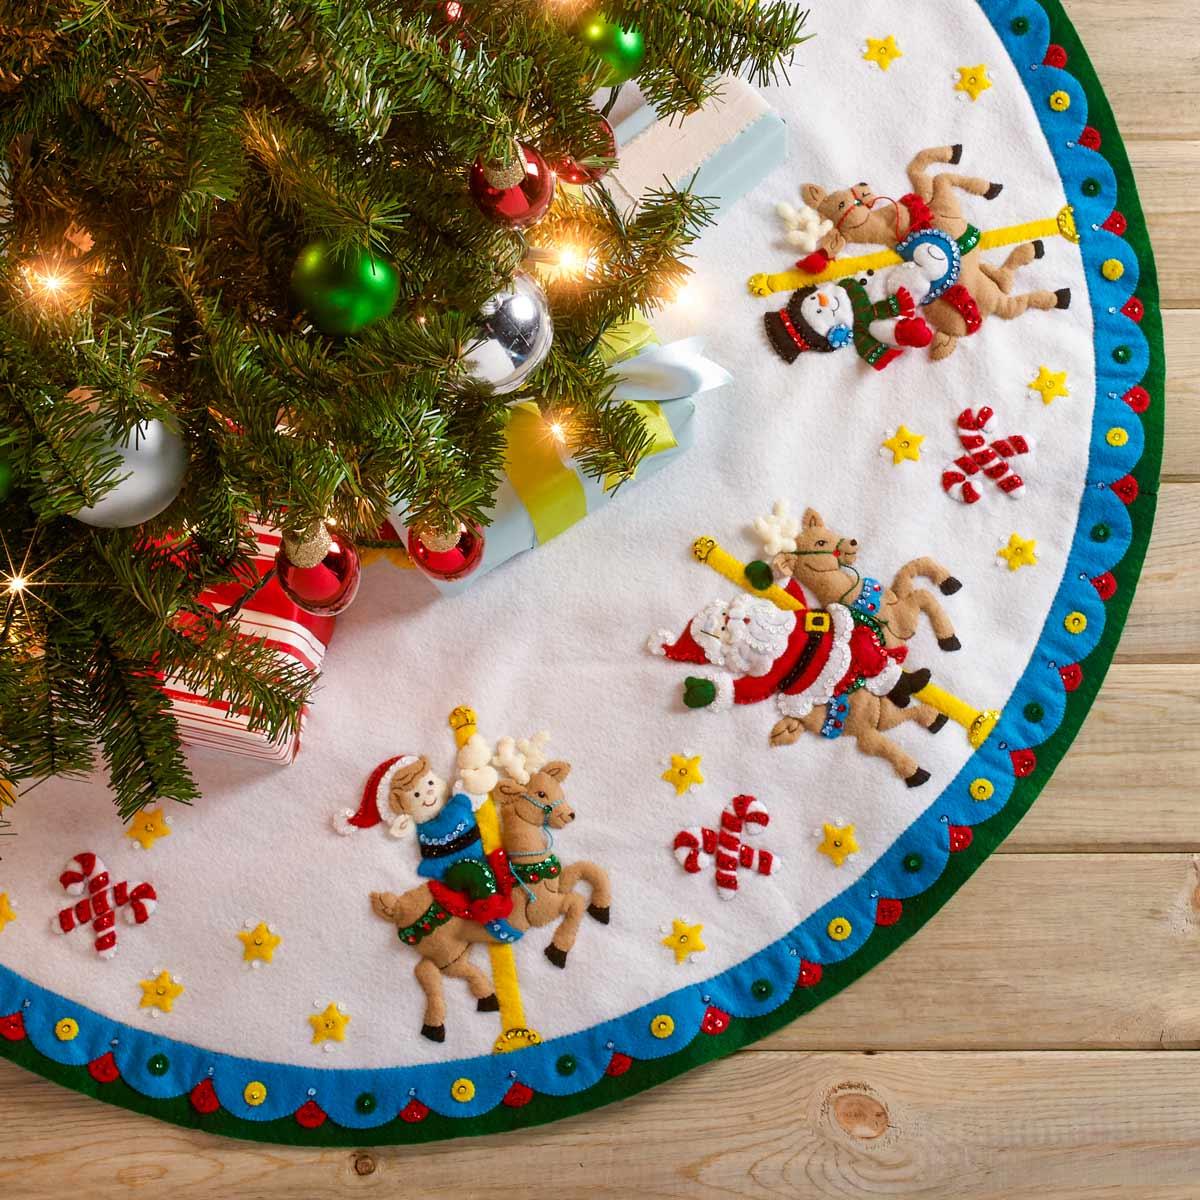 Bucilla ® Seasonal - Felt - Tree Skirt Kits - Carousel Santa